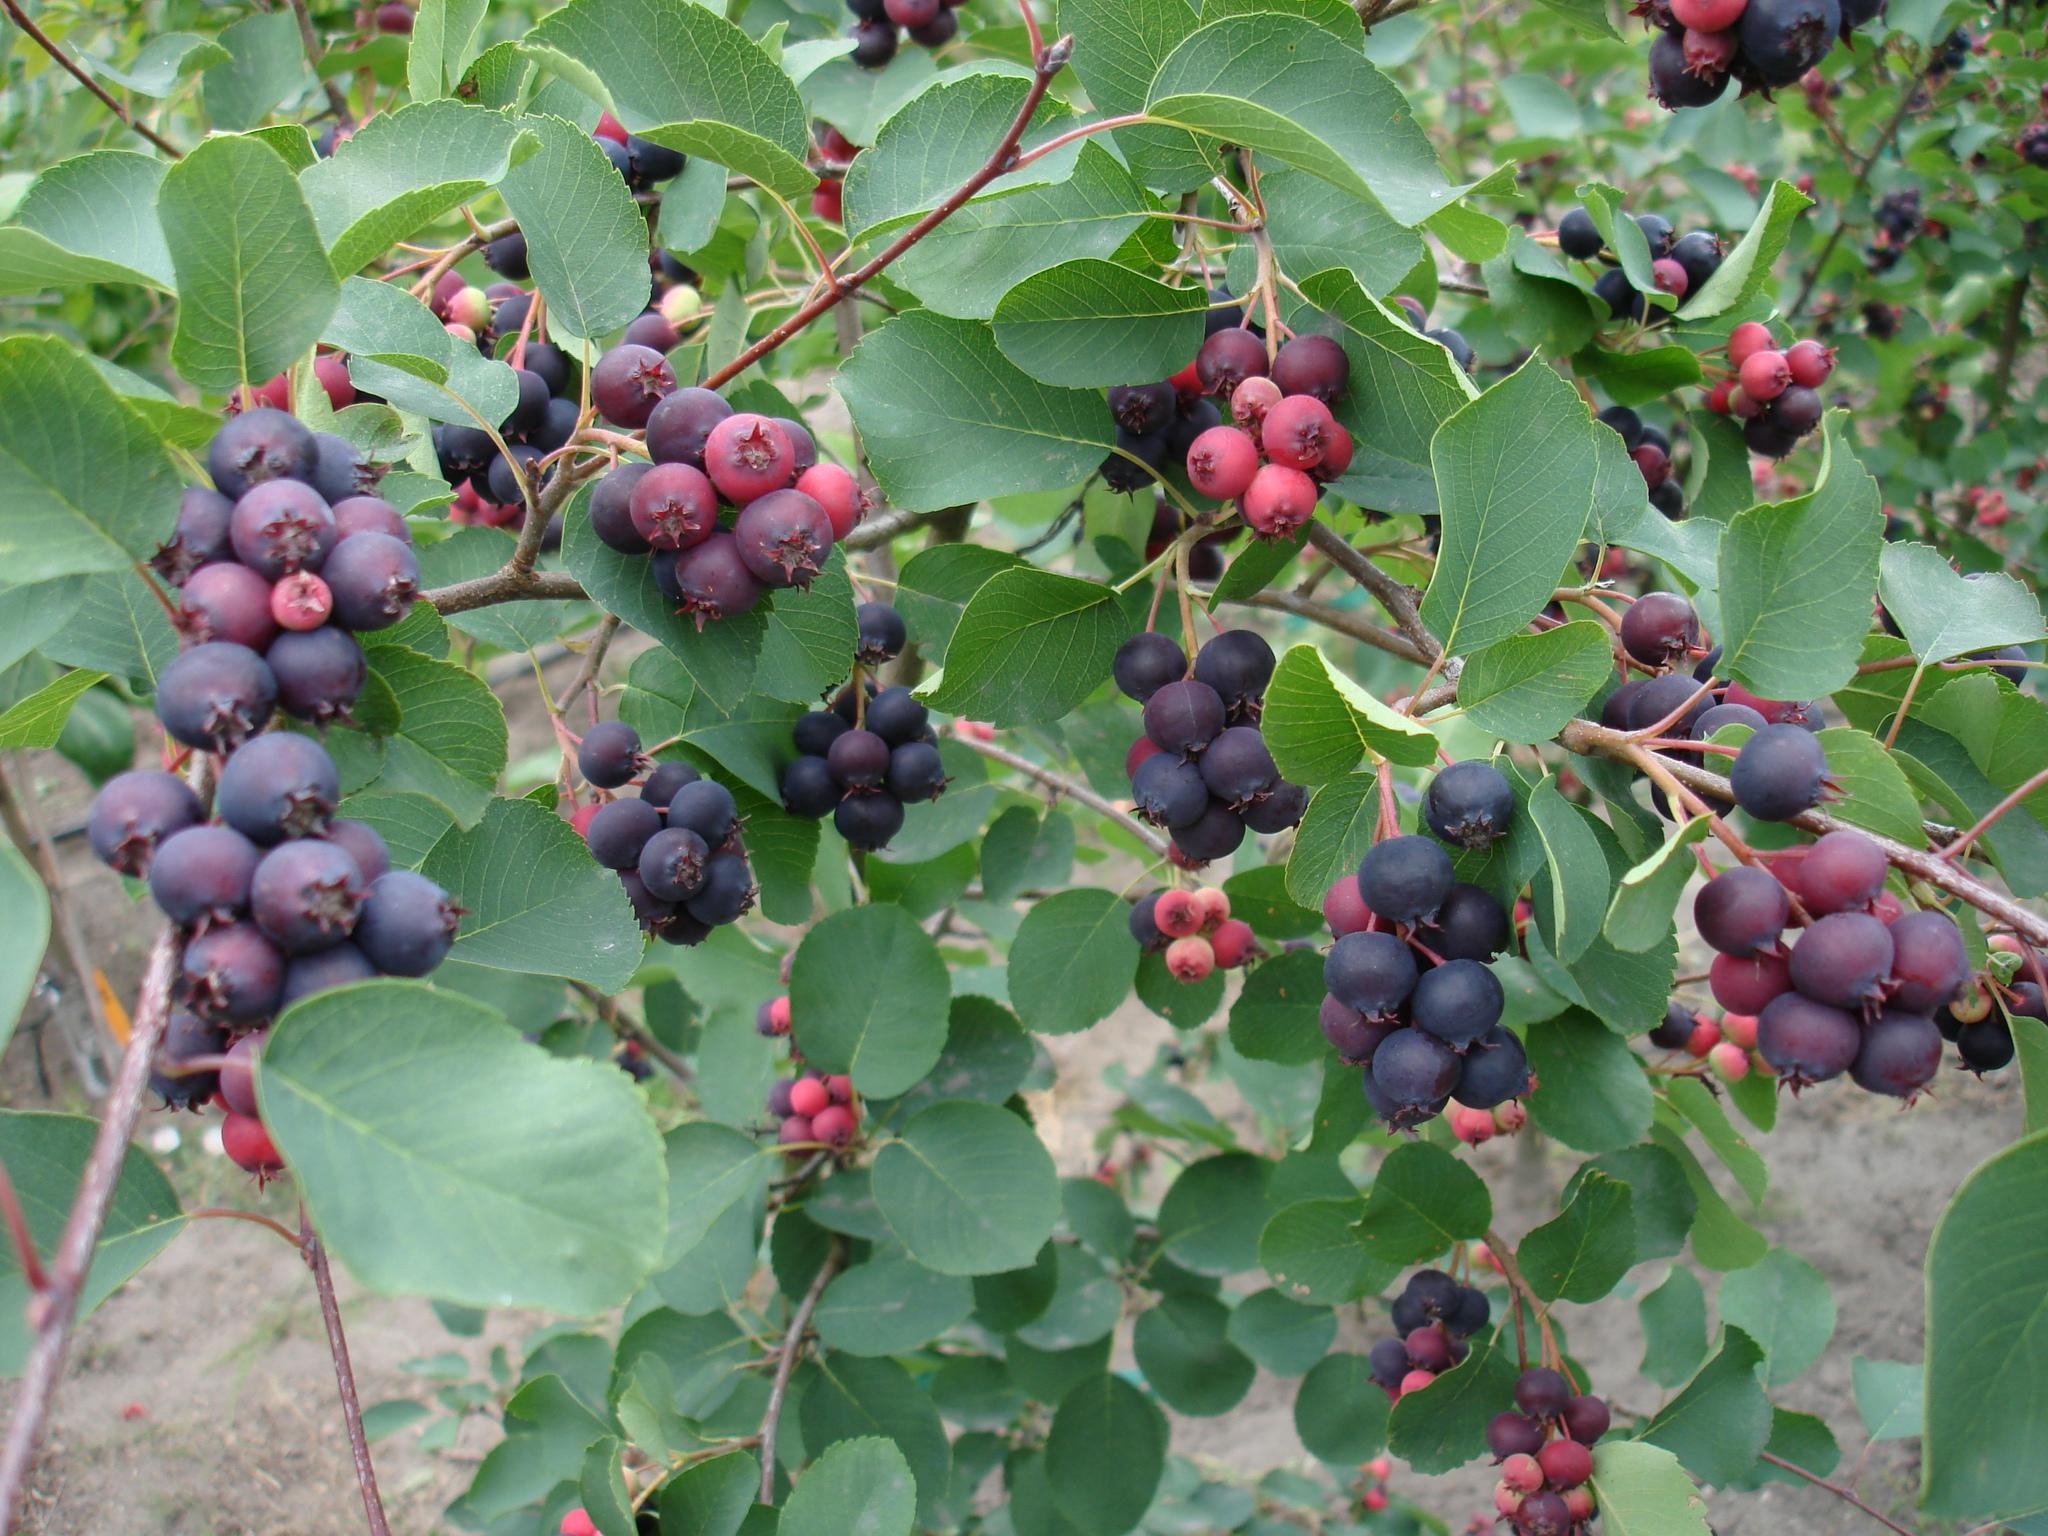 amelanchier-alnifolia-Forestburg-owoce06698.JPG